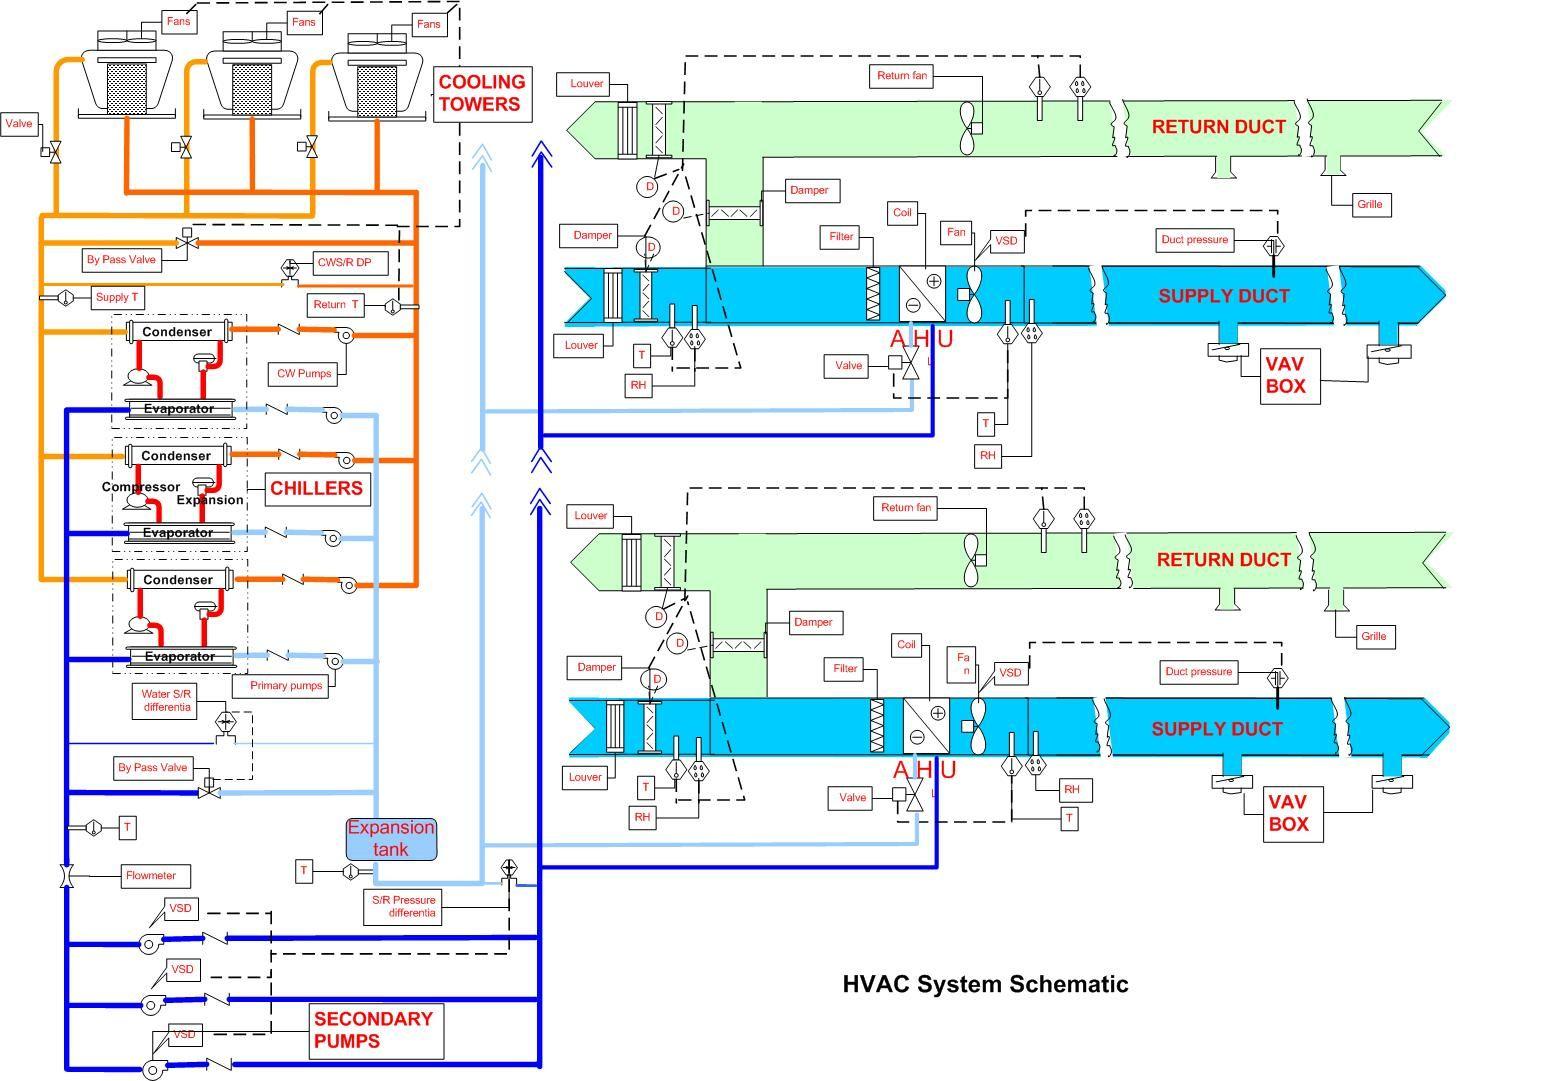 Refrigeration Unit Plumbing Schematic   Licensed HVAC and